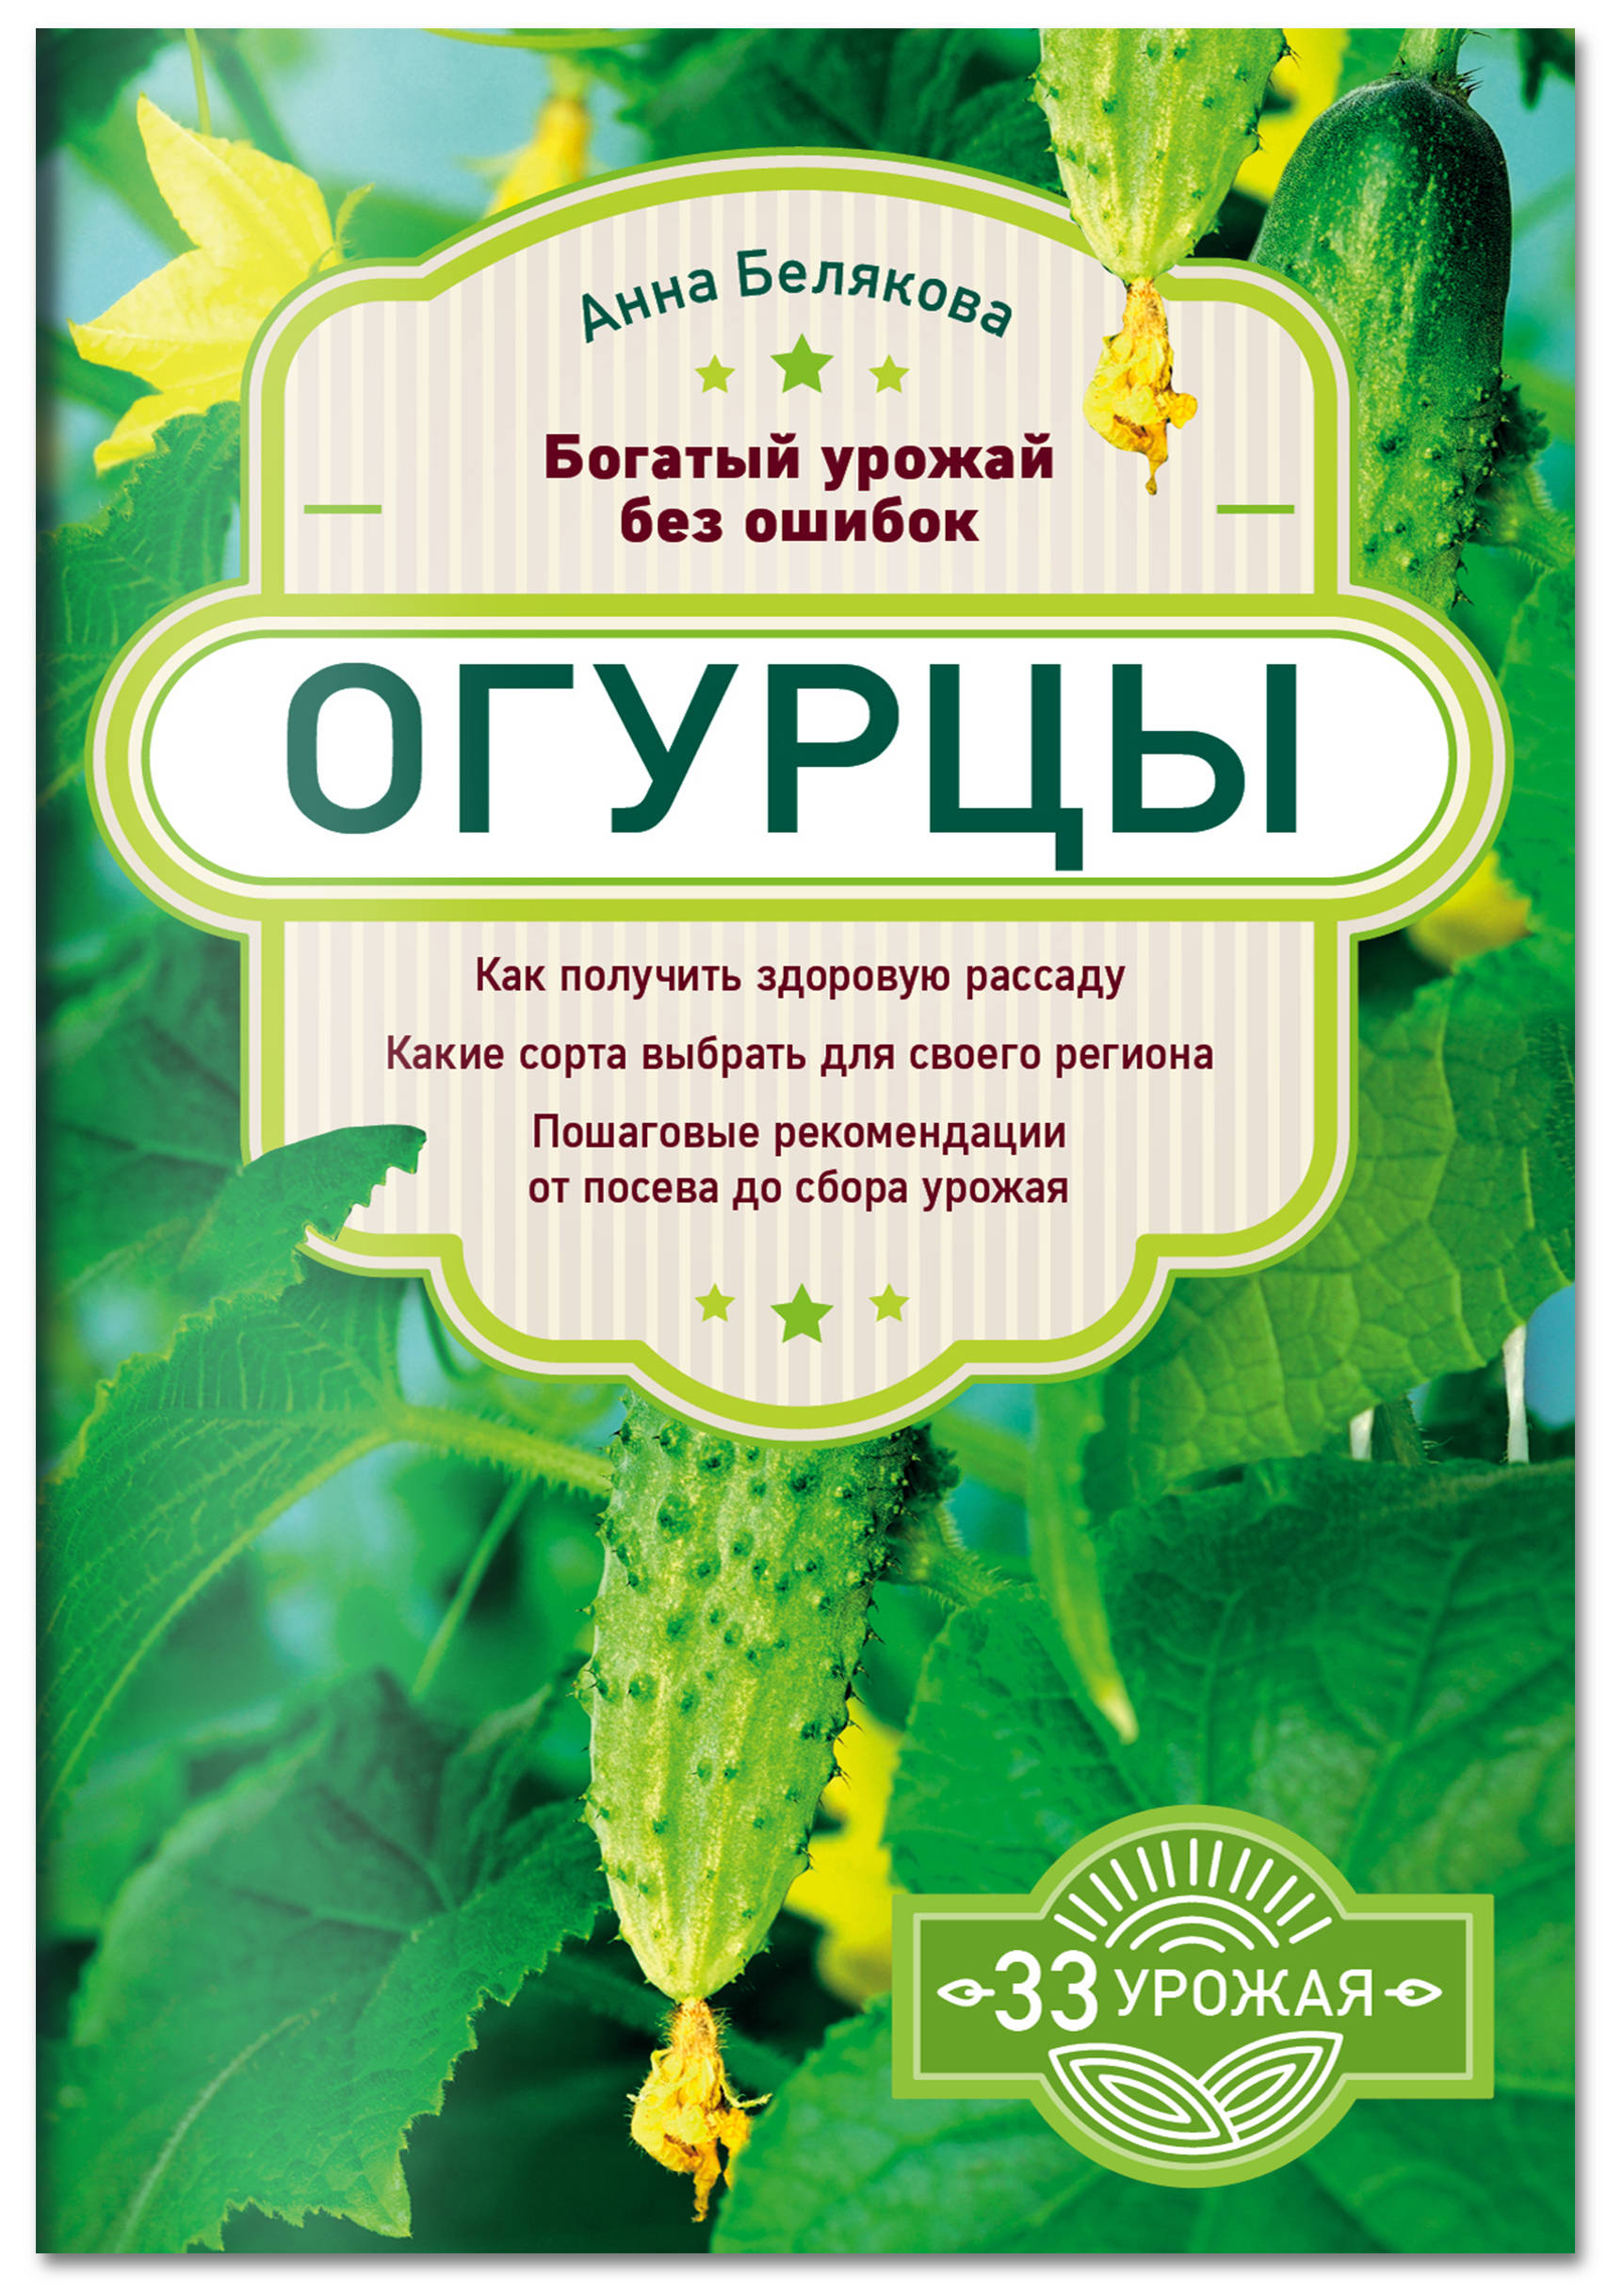 Анна Белякова Огурцы. Богатый урожай без ошибок